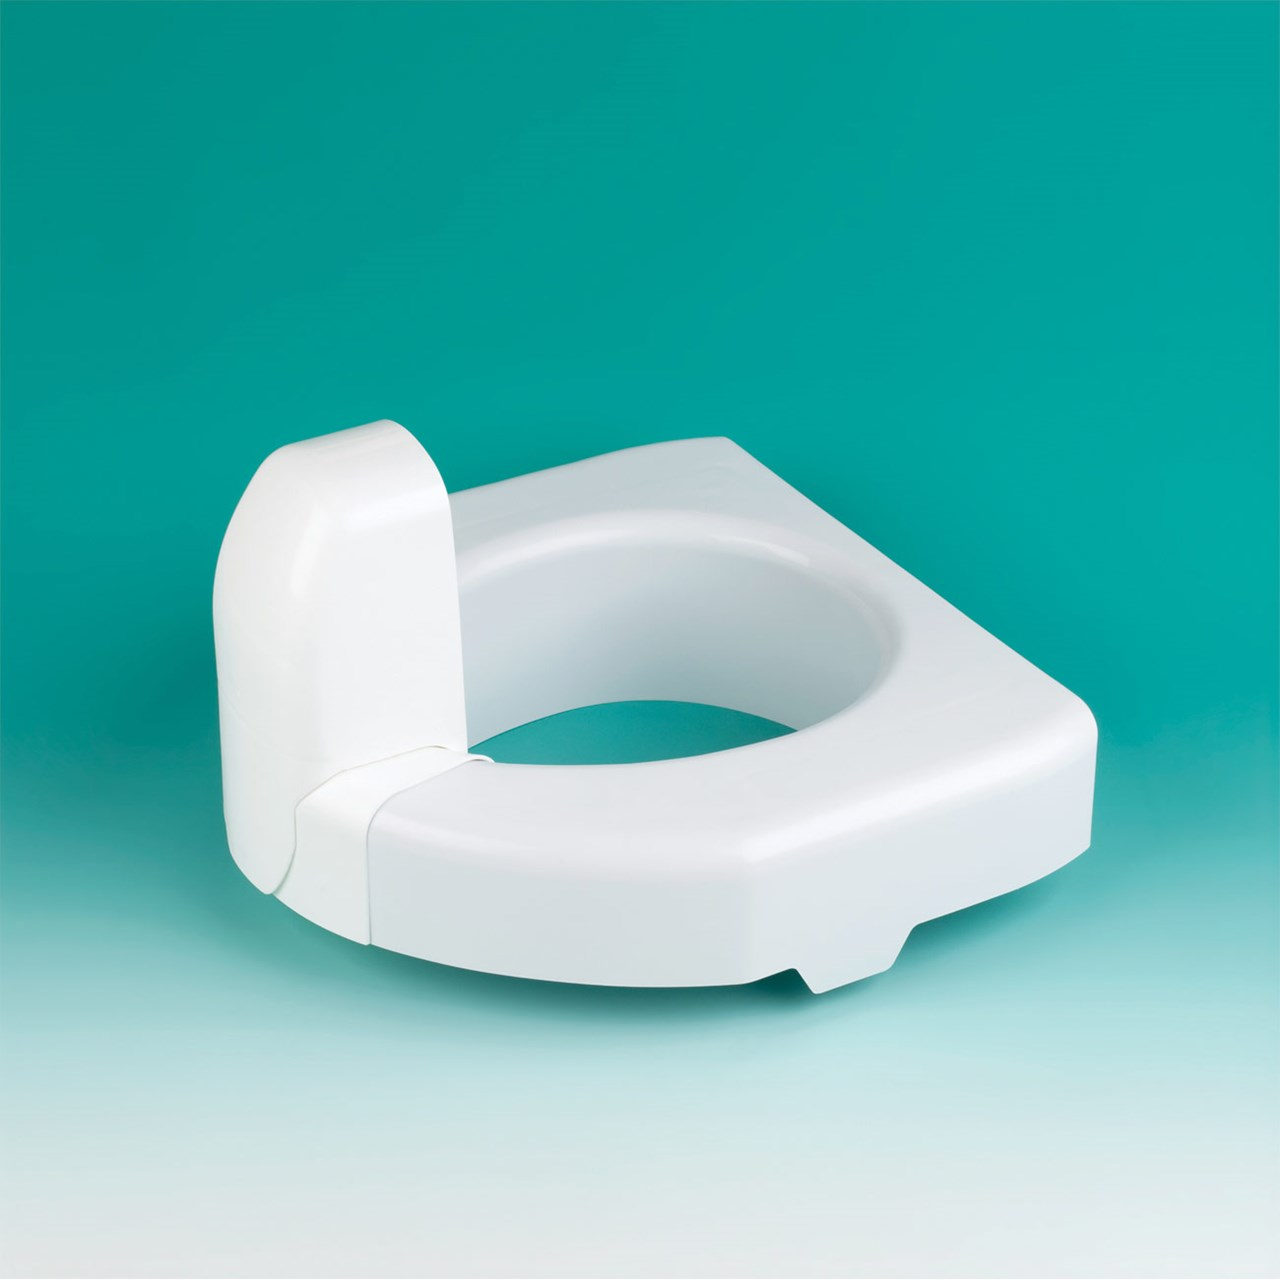 Splash Guard For Toilet Seat.Maddaguard Splash Guard